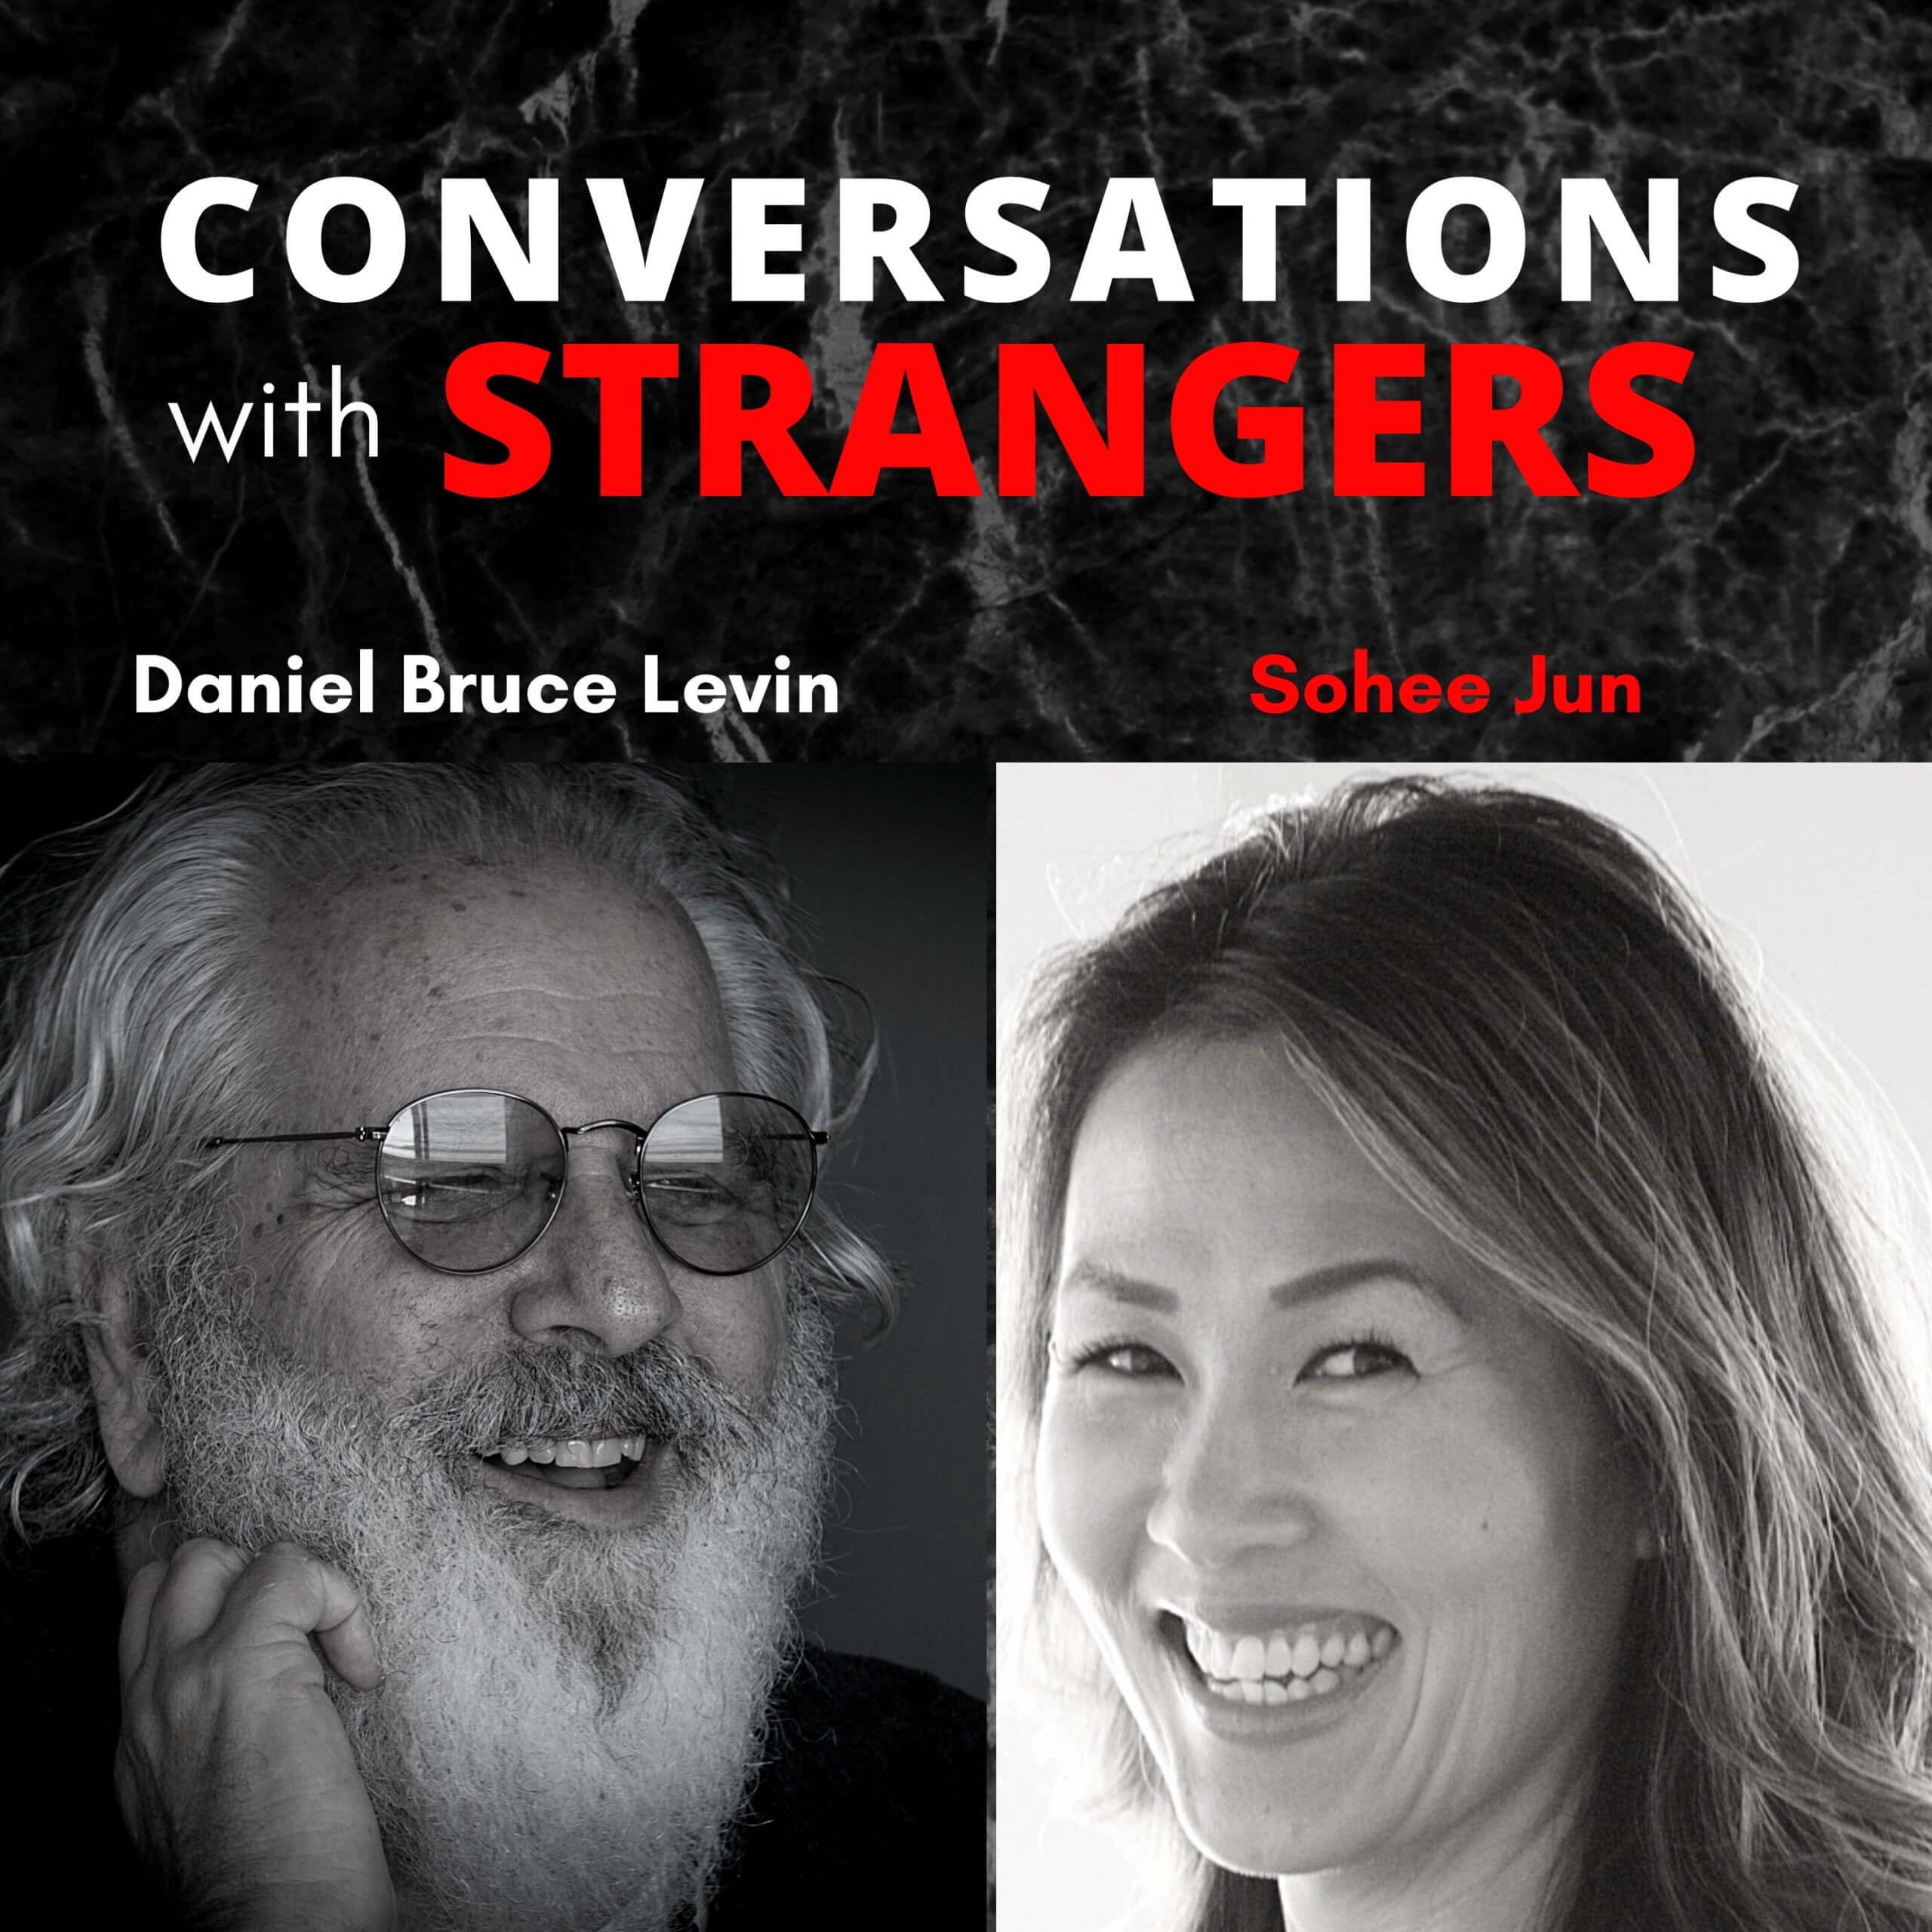 Conversations with Strangers feat. Sohee Jun